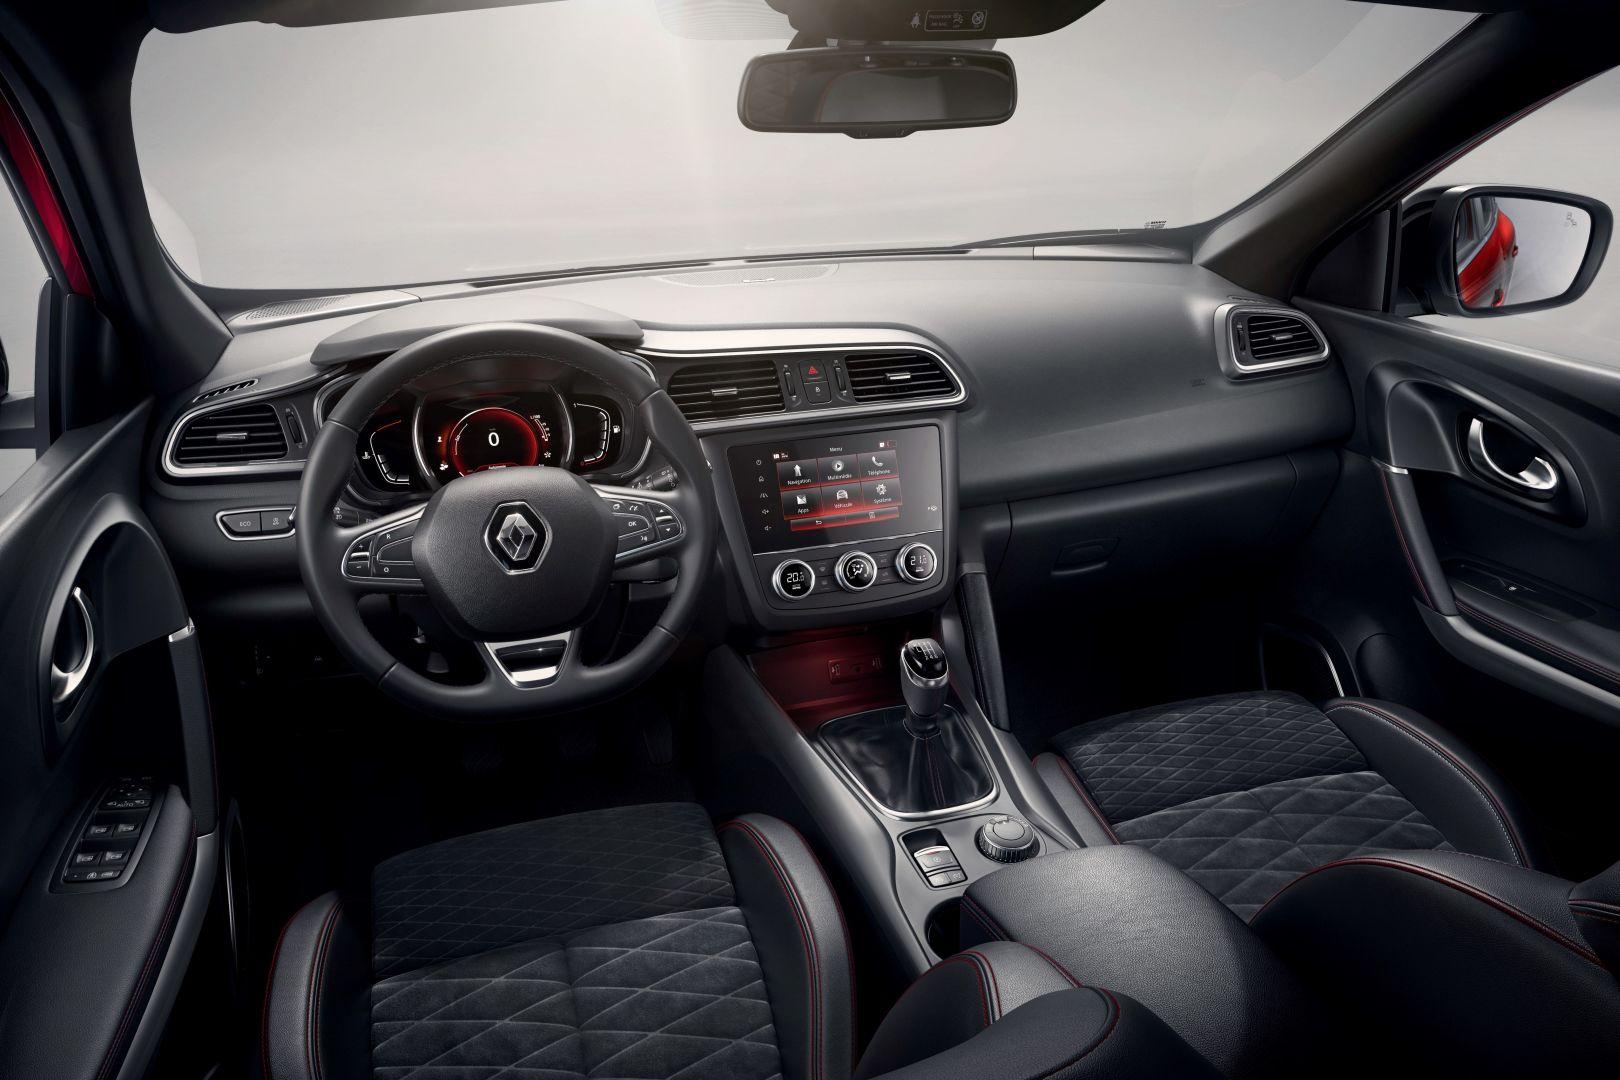 2020 Renault Kadjar History